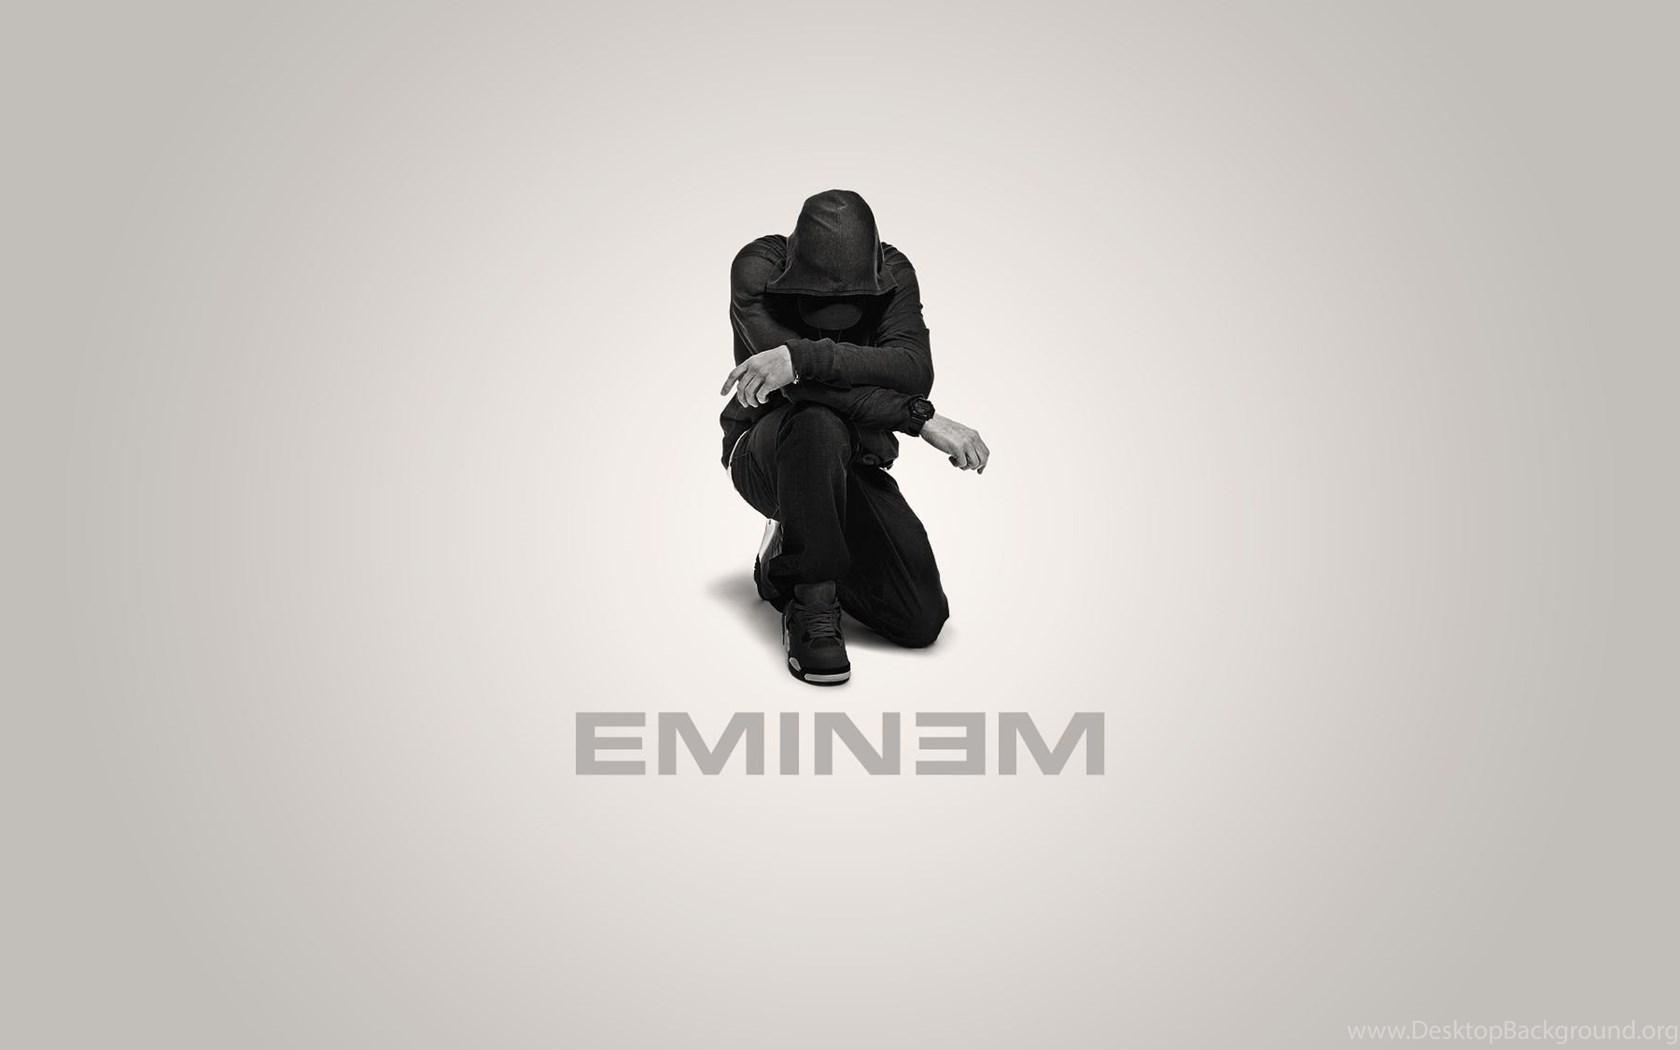 Download Wallpaper Logo Eminem - 211818_eminem-wallpapers-hd-a2-wallpapers_2000x1125_h  HD_307056.jpg